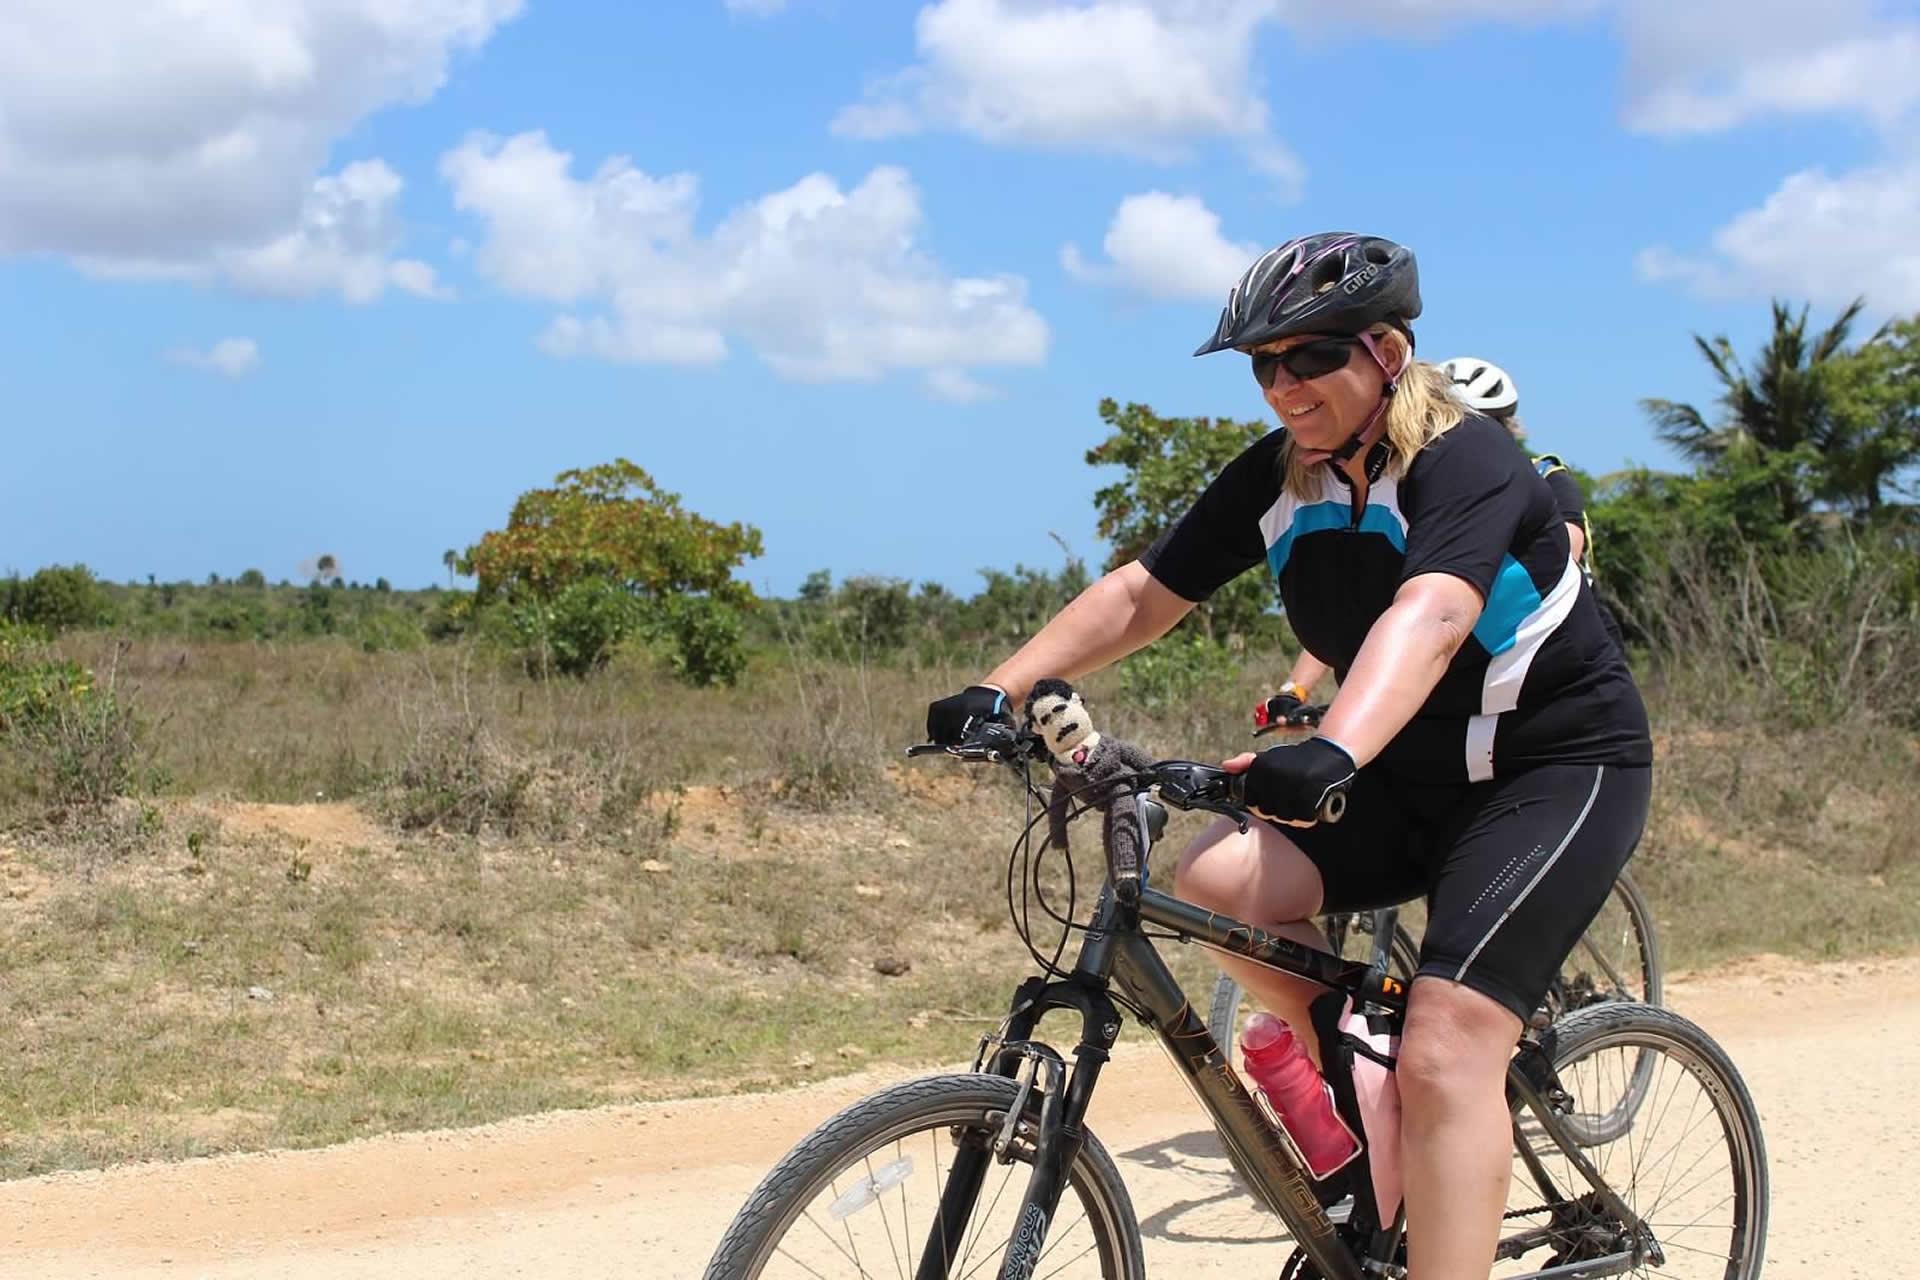 Cycle Moshi to Zanzibar